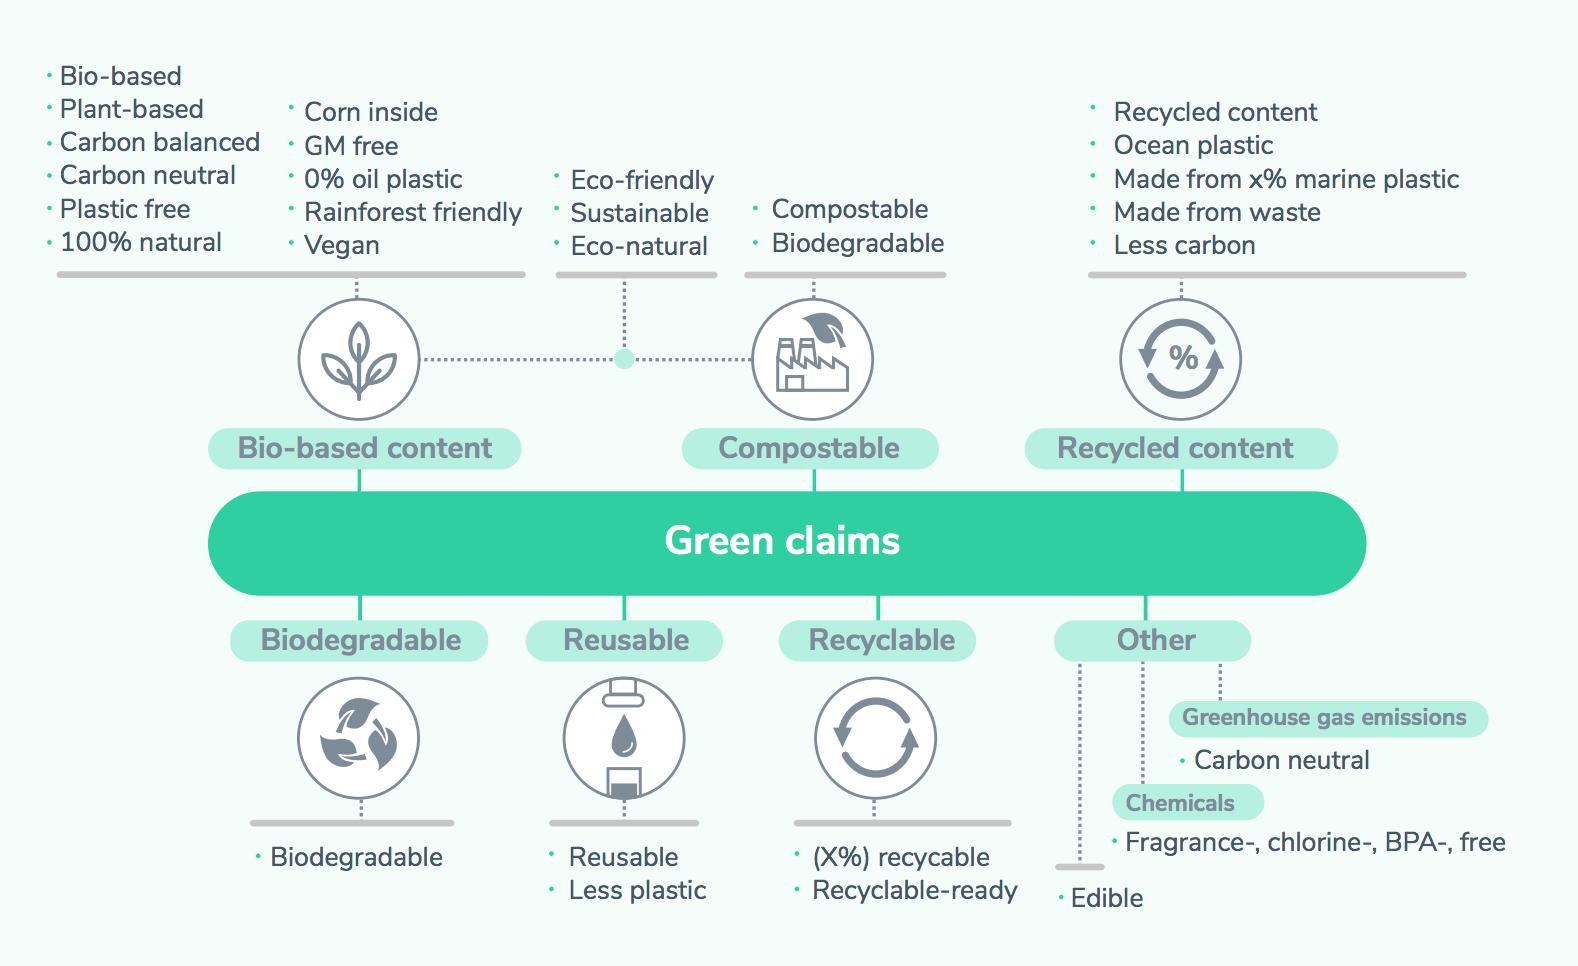 Grüne Behauptungen